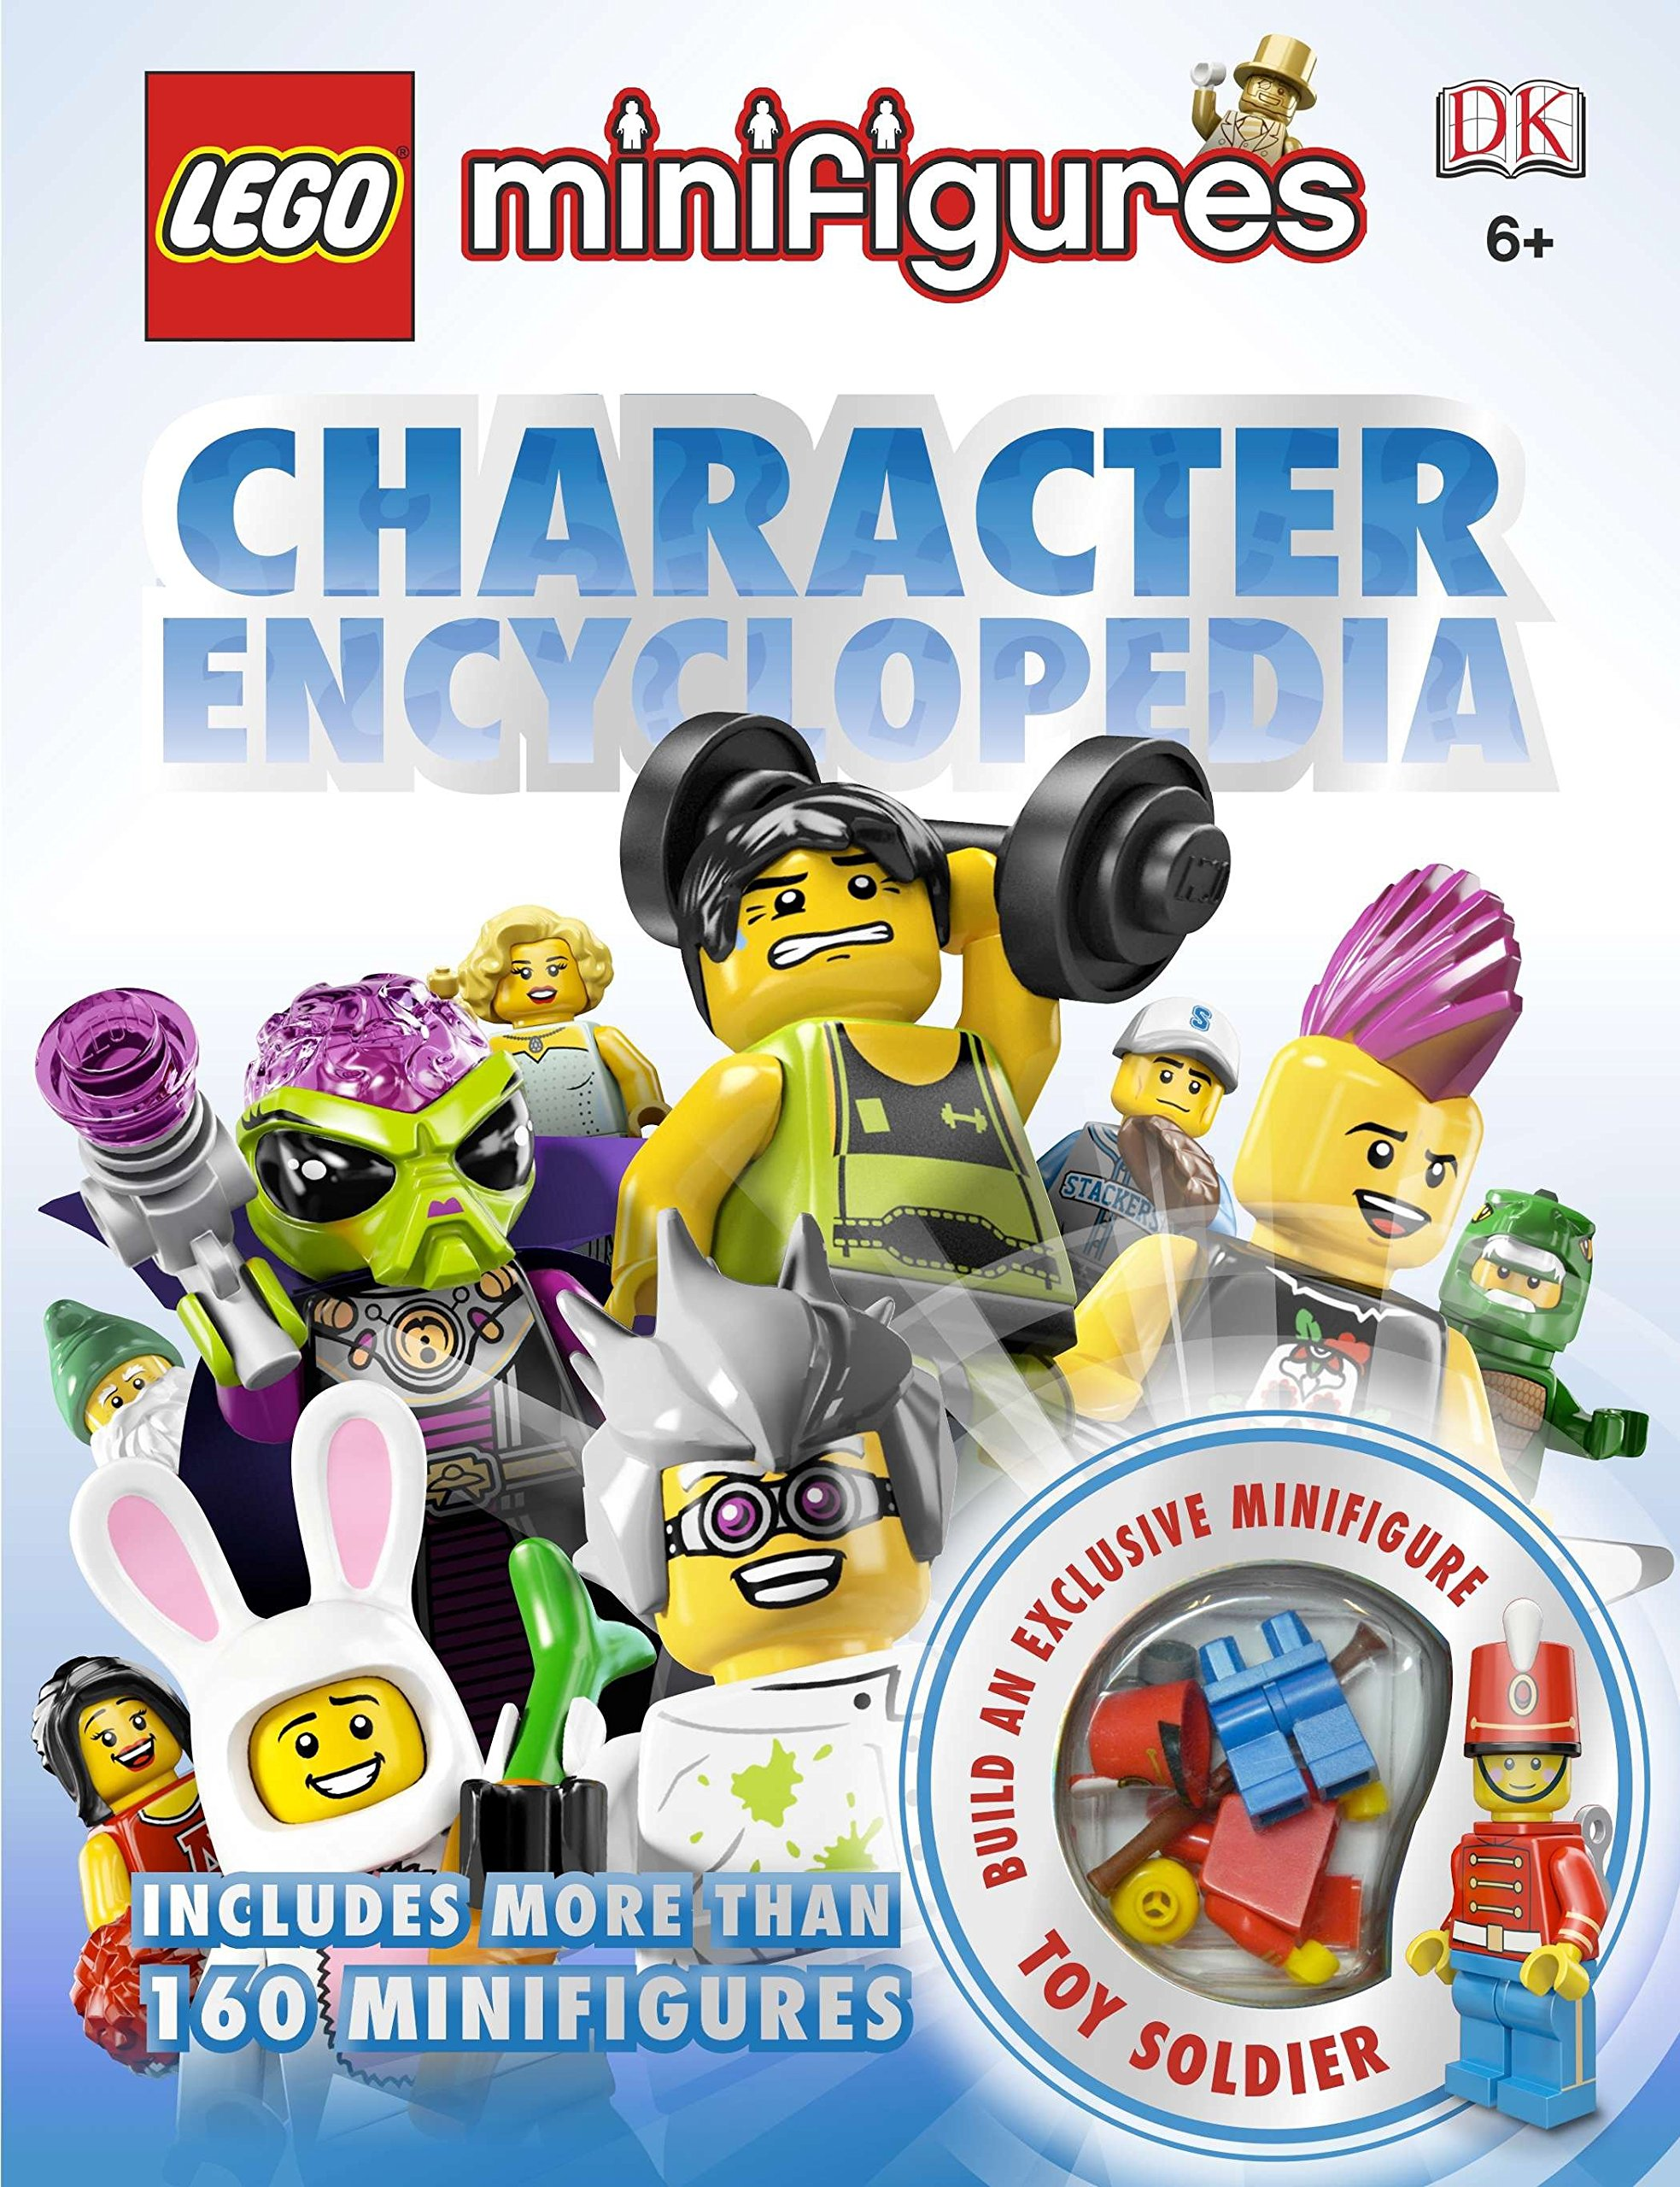 LEGO Minifigures Encyclopedia Daniel Lipkowitz product image